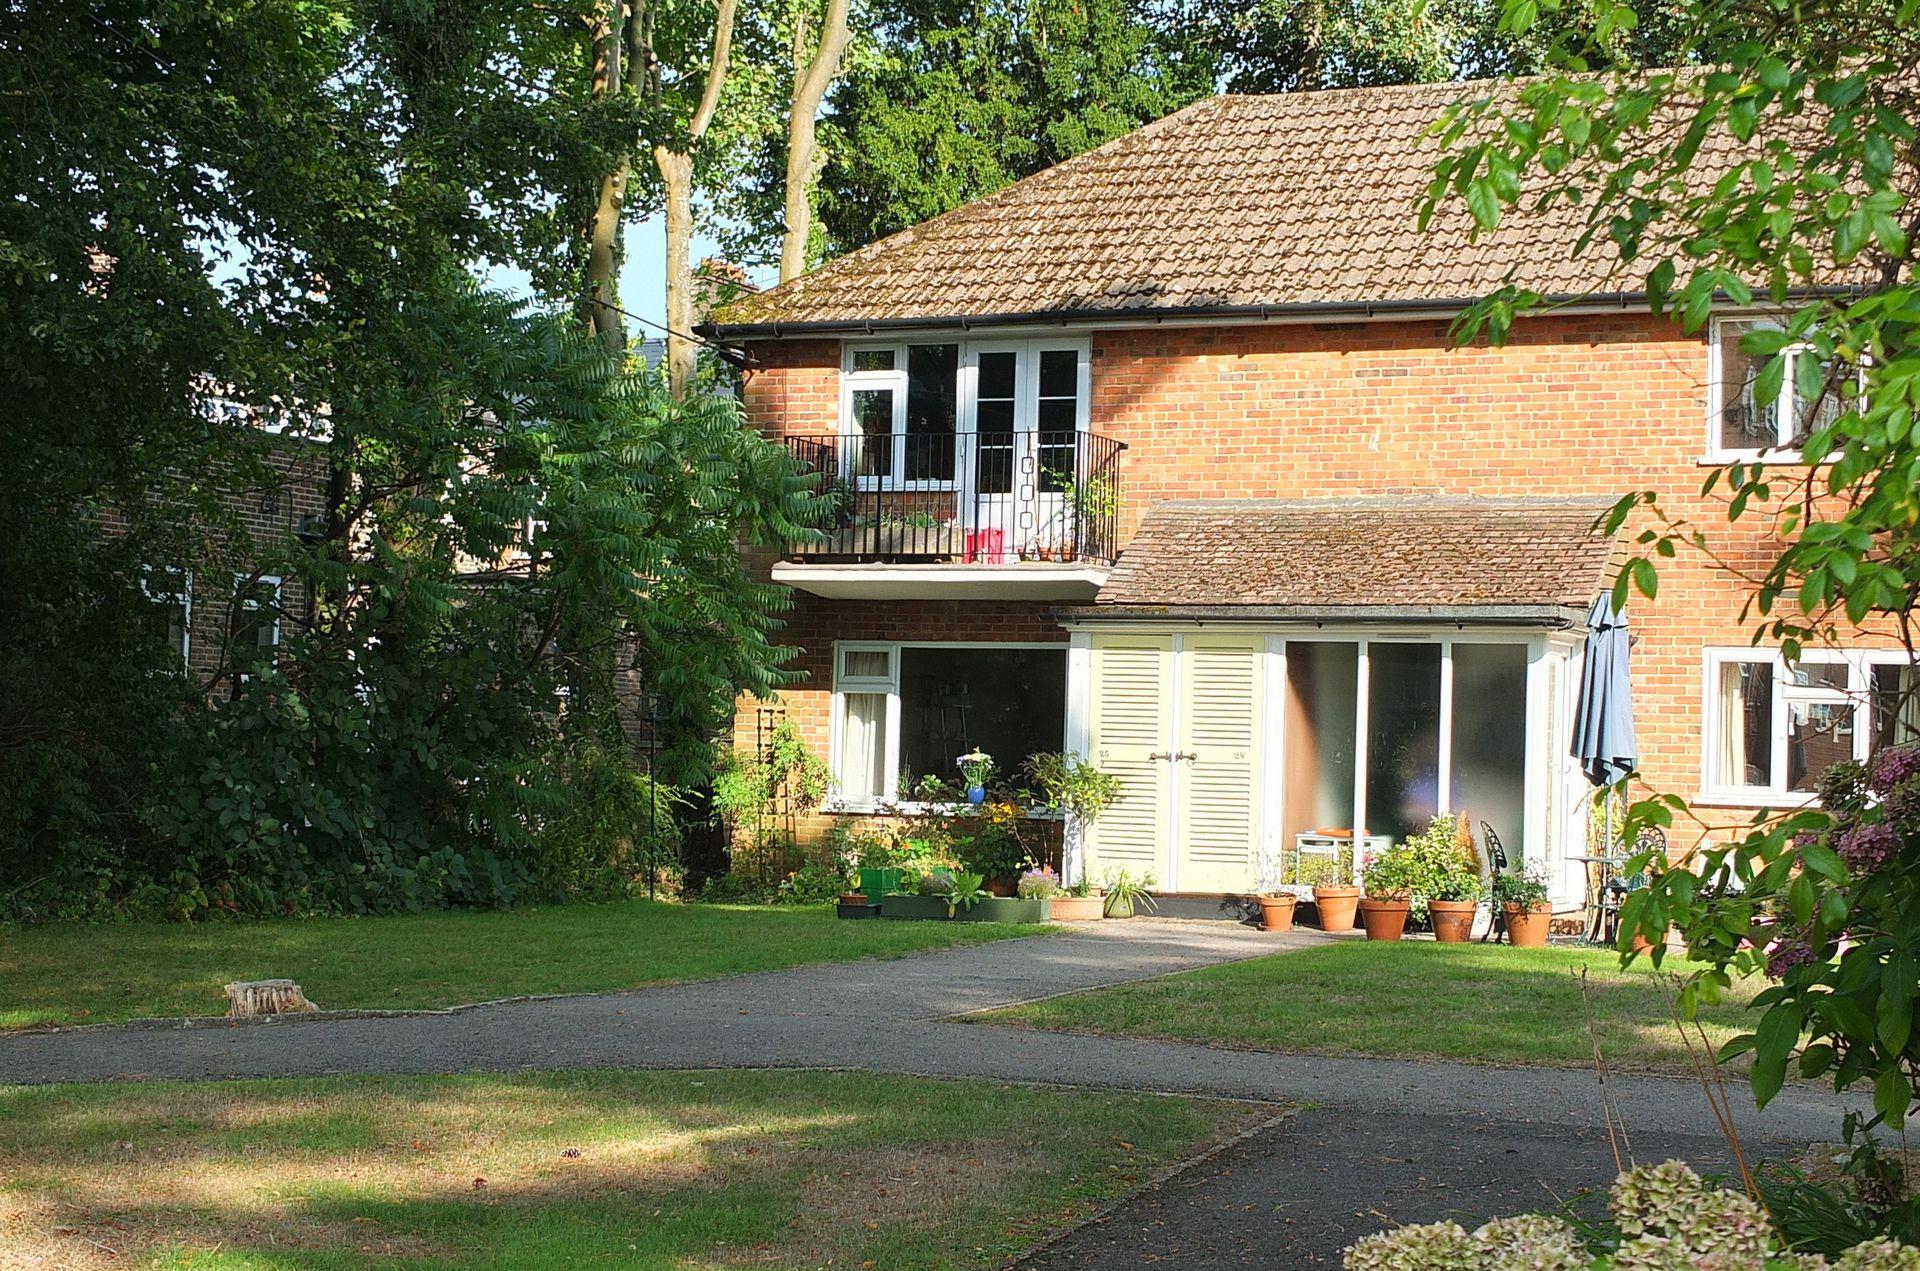 Photo 11, Muster Green, Haywards Heath, RH16